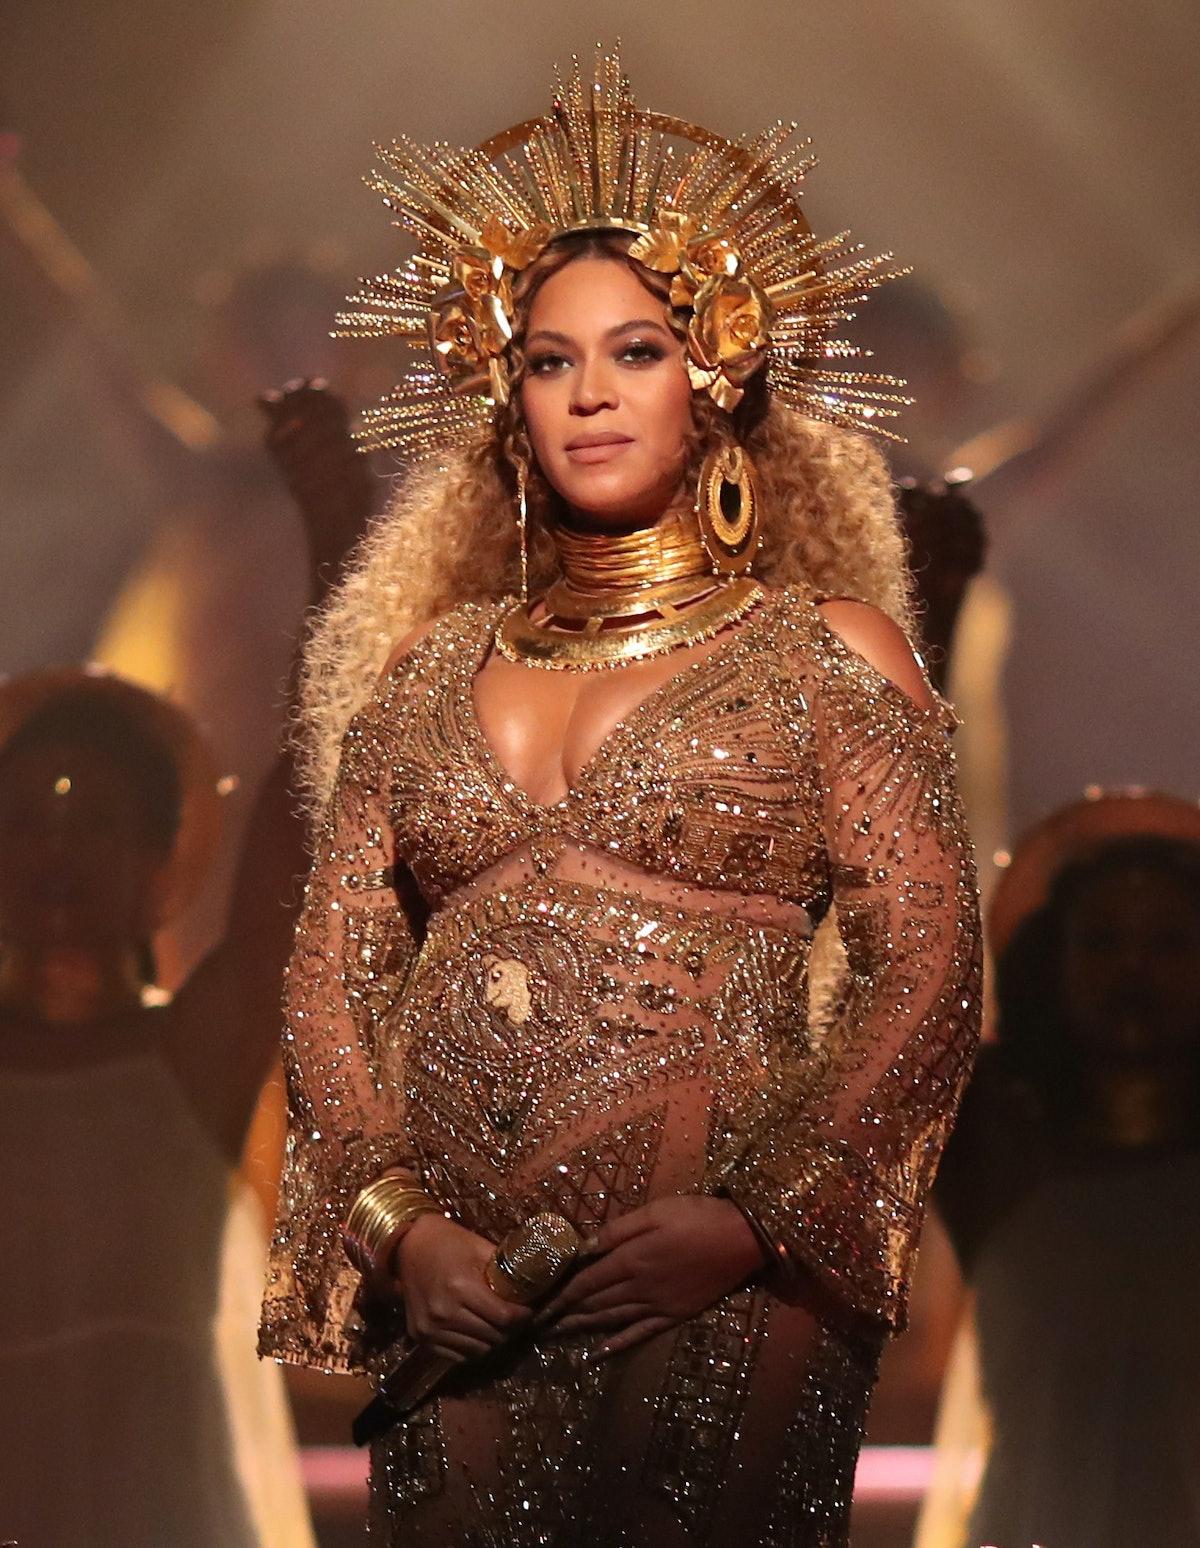 7 Celebs Who Had Preeclampsia During Pregnancy, Including Beyonce, Kim Kardashian, & More